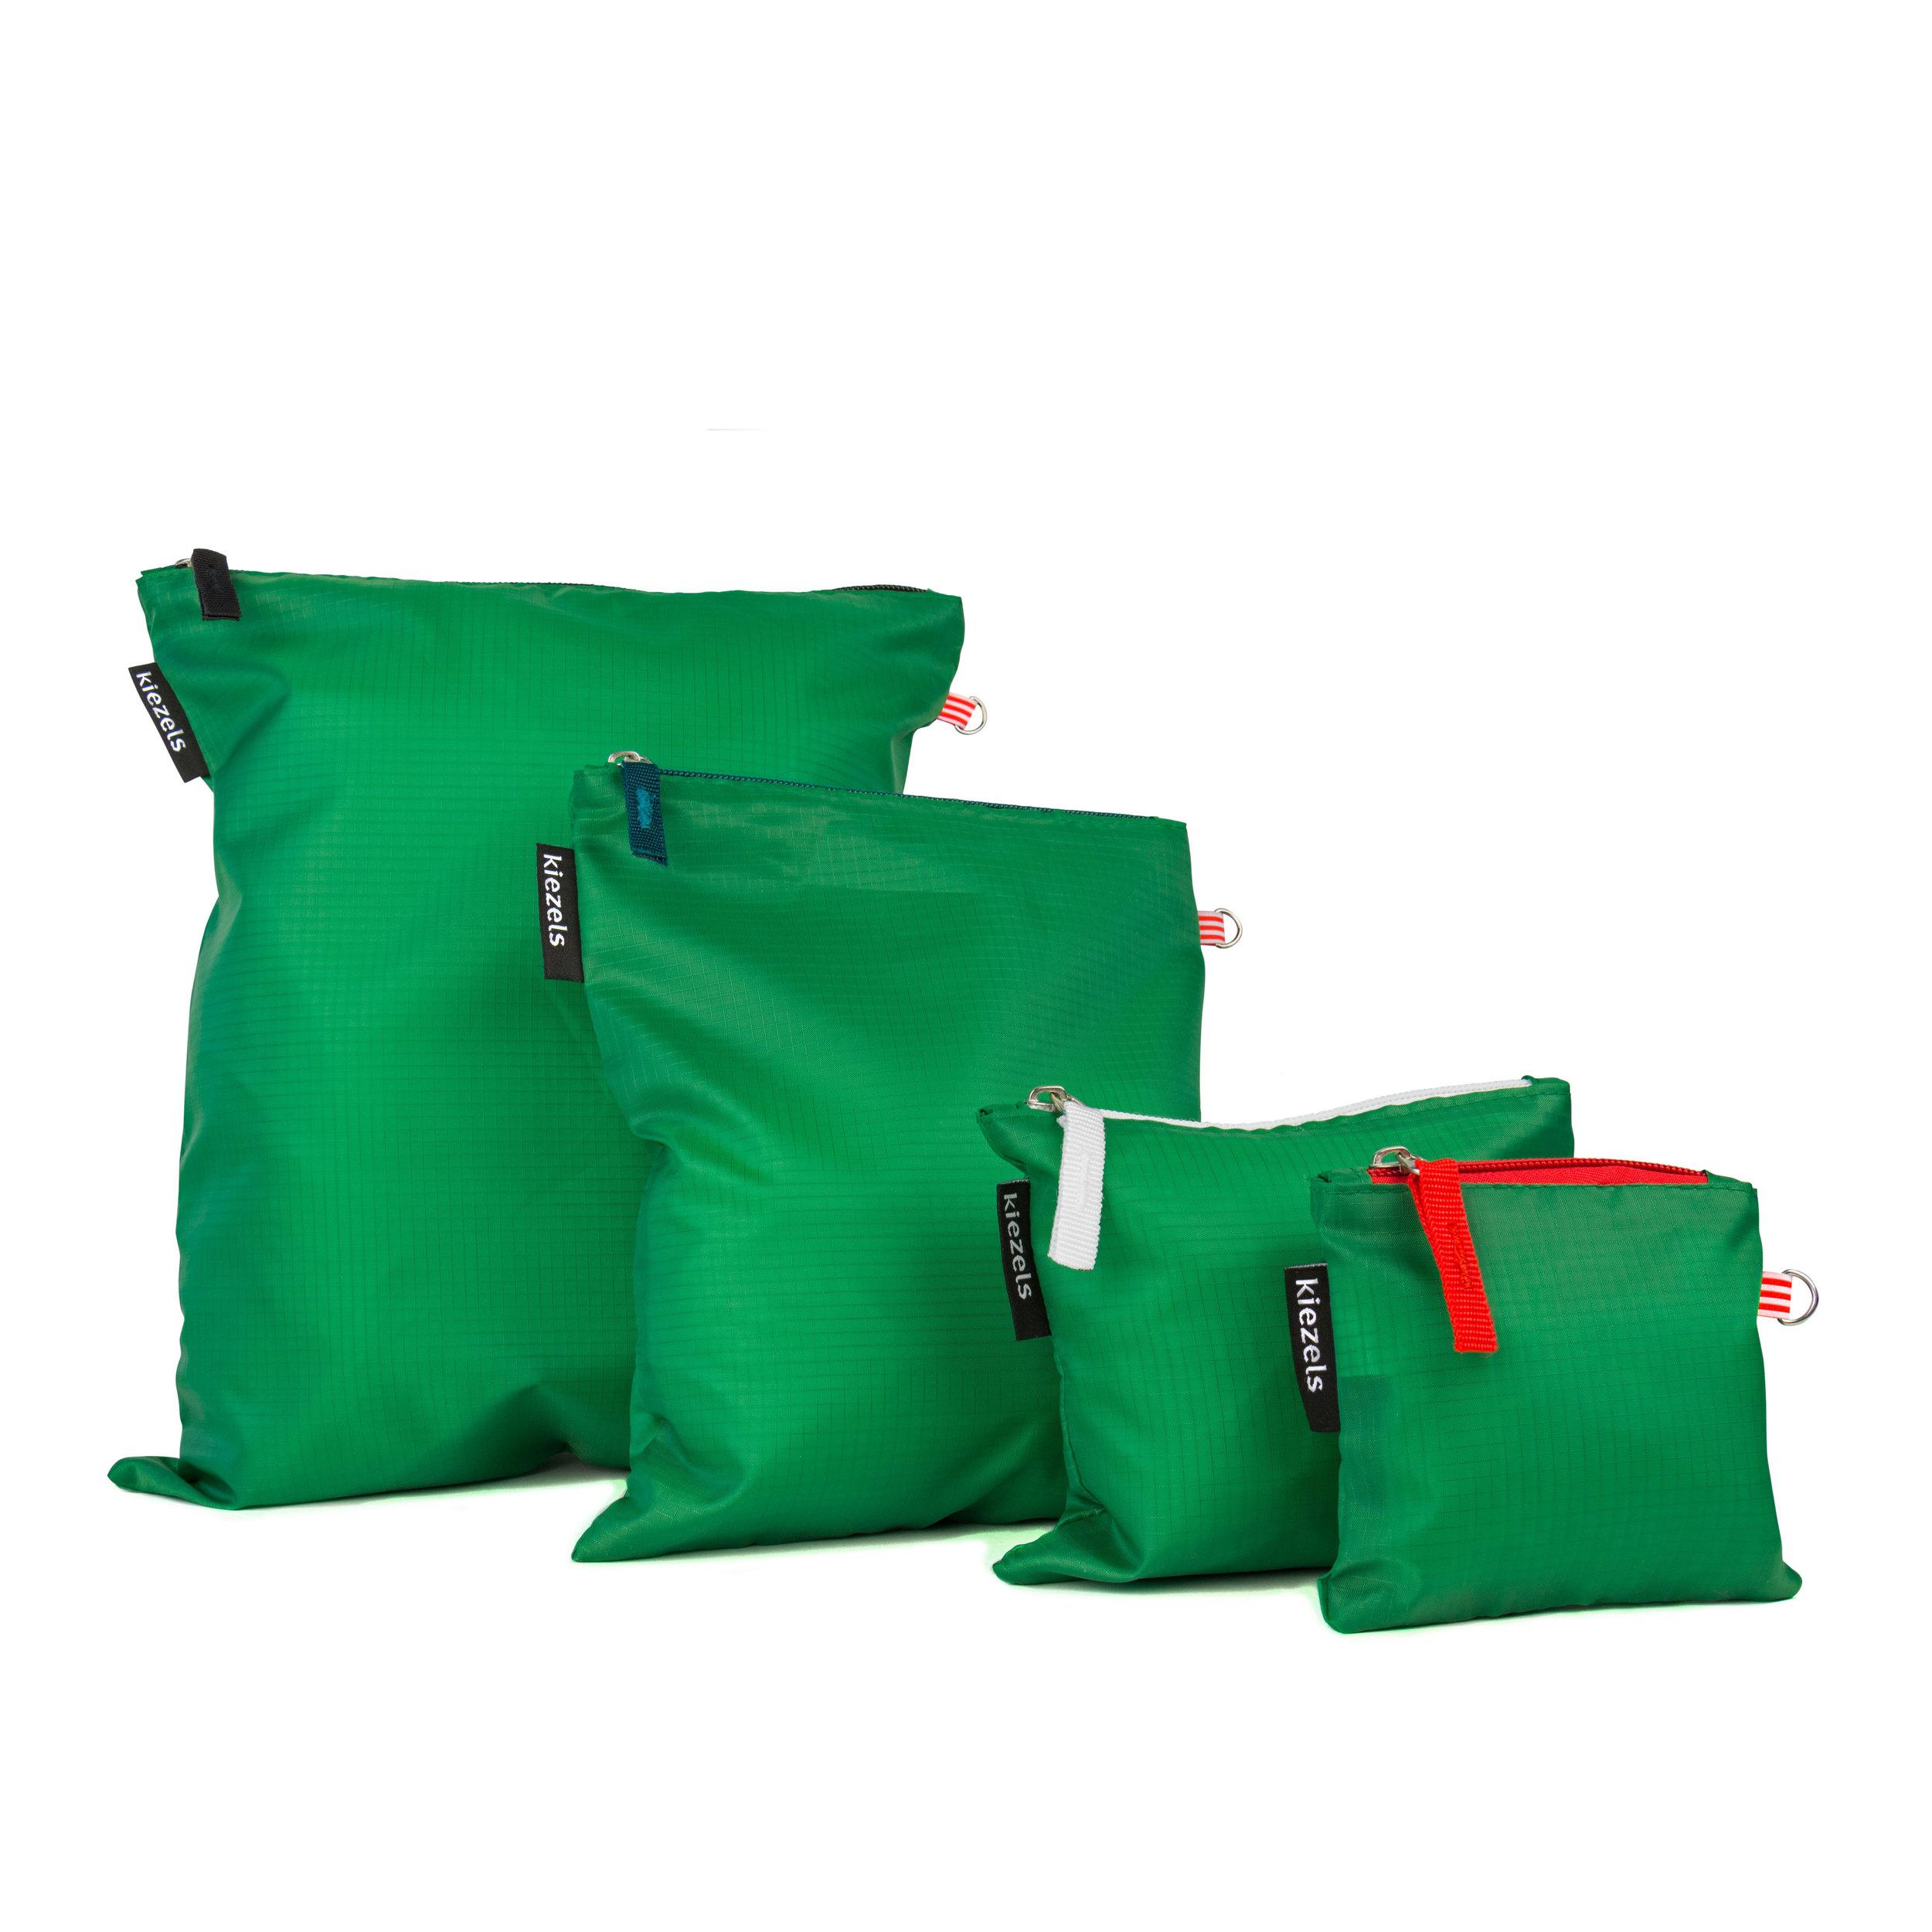 No. 203 Travel organiser bags - green € 18,50